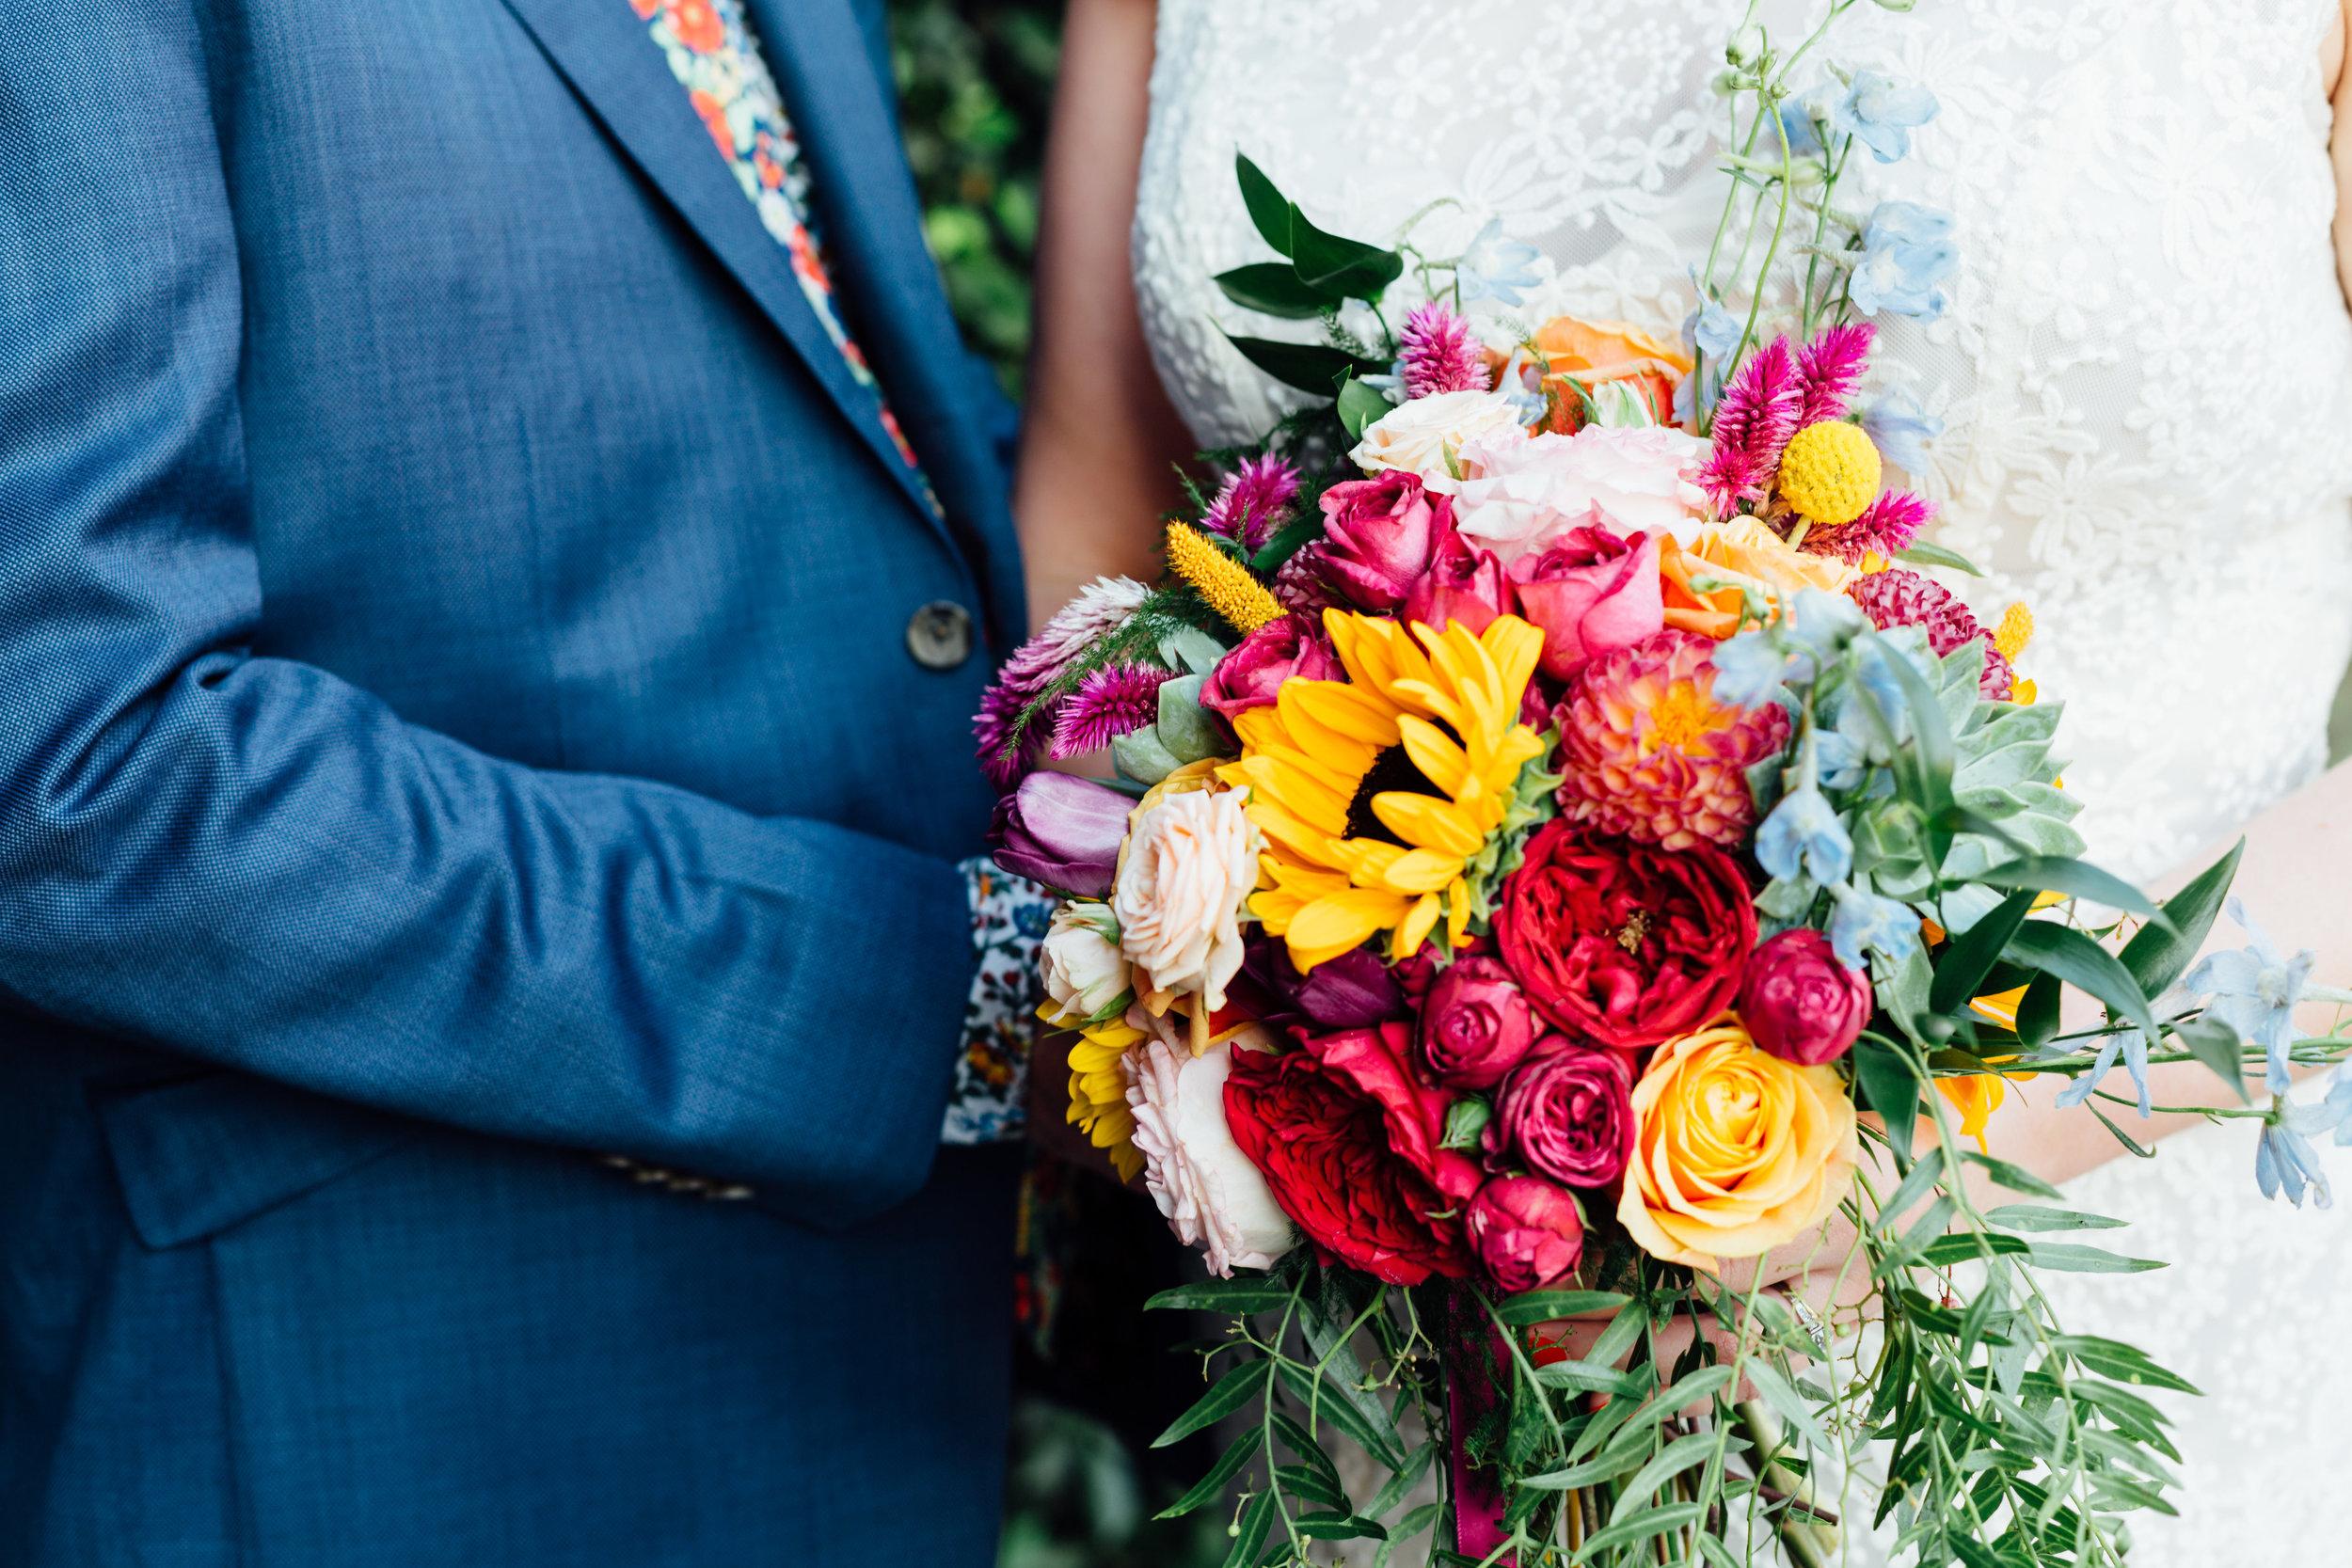 Sibyl_Sophia_Des_Moines_Iowa_Bright_Wedding_Florals_Bridal_Bouquet.jpg